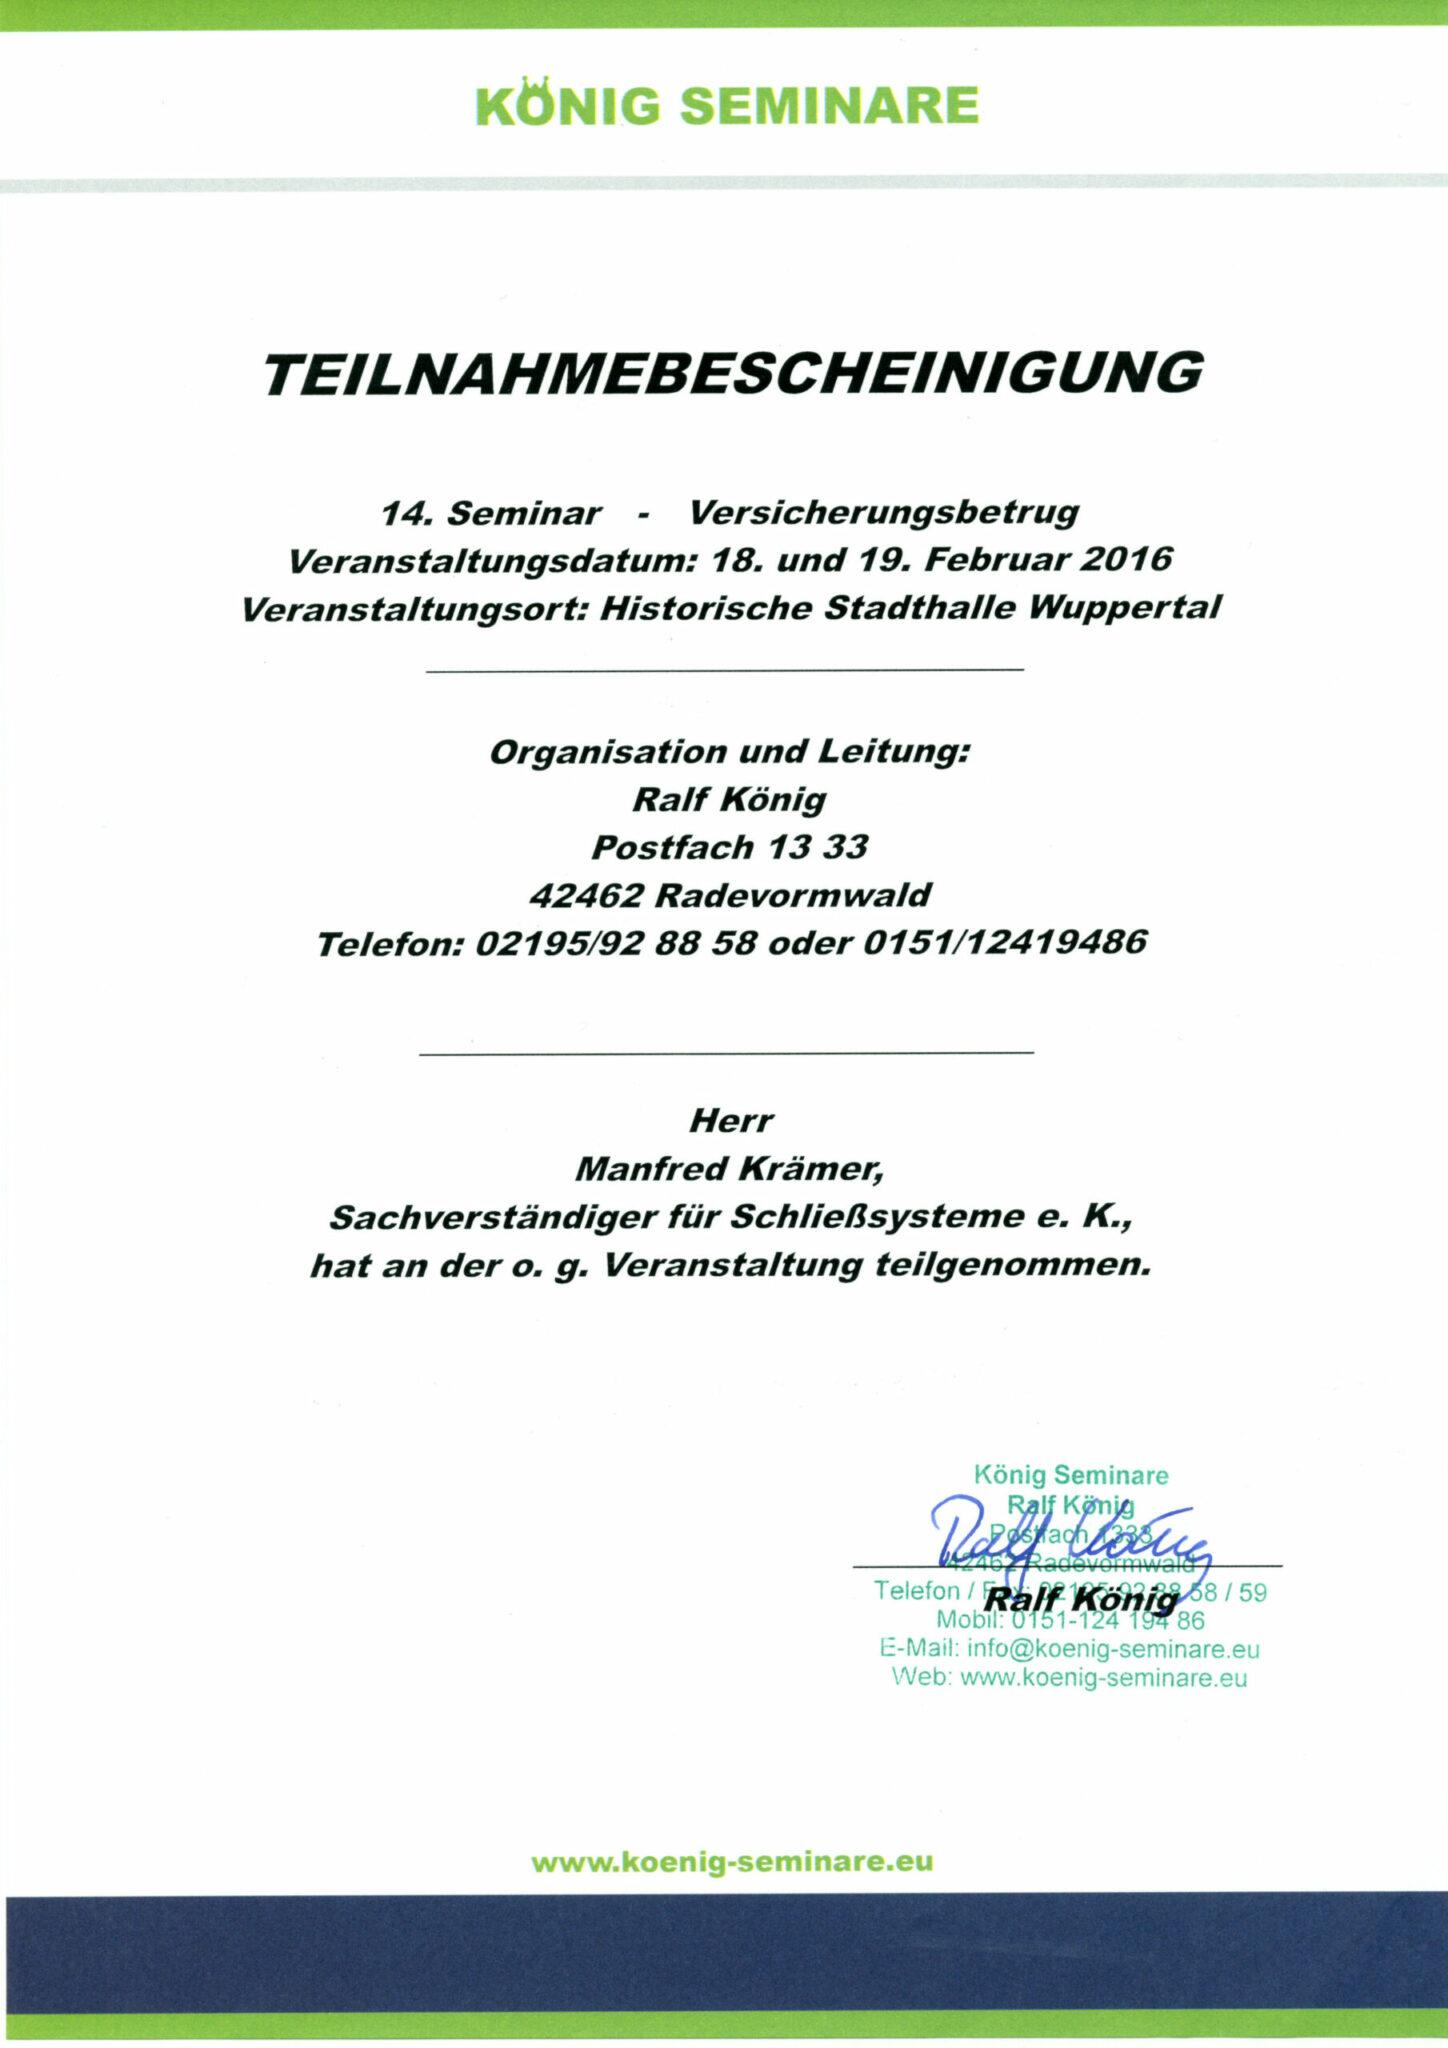 König Seminar Zertifikat 2016